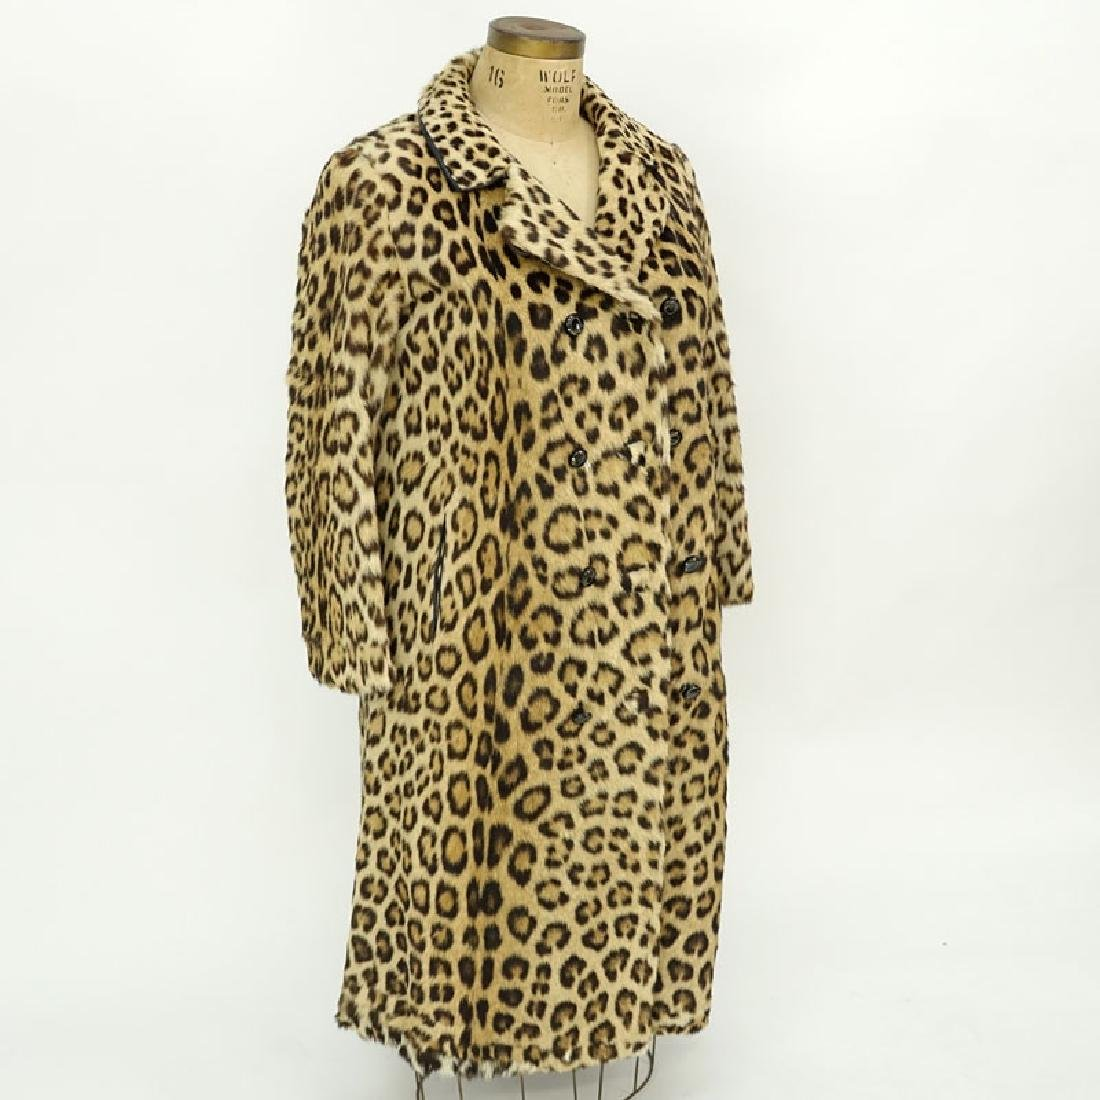 Vintage S. Schiffman Leopard Fur Coat. Fabric lining.